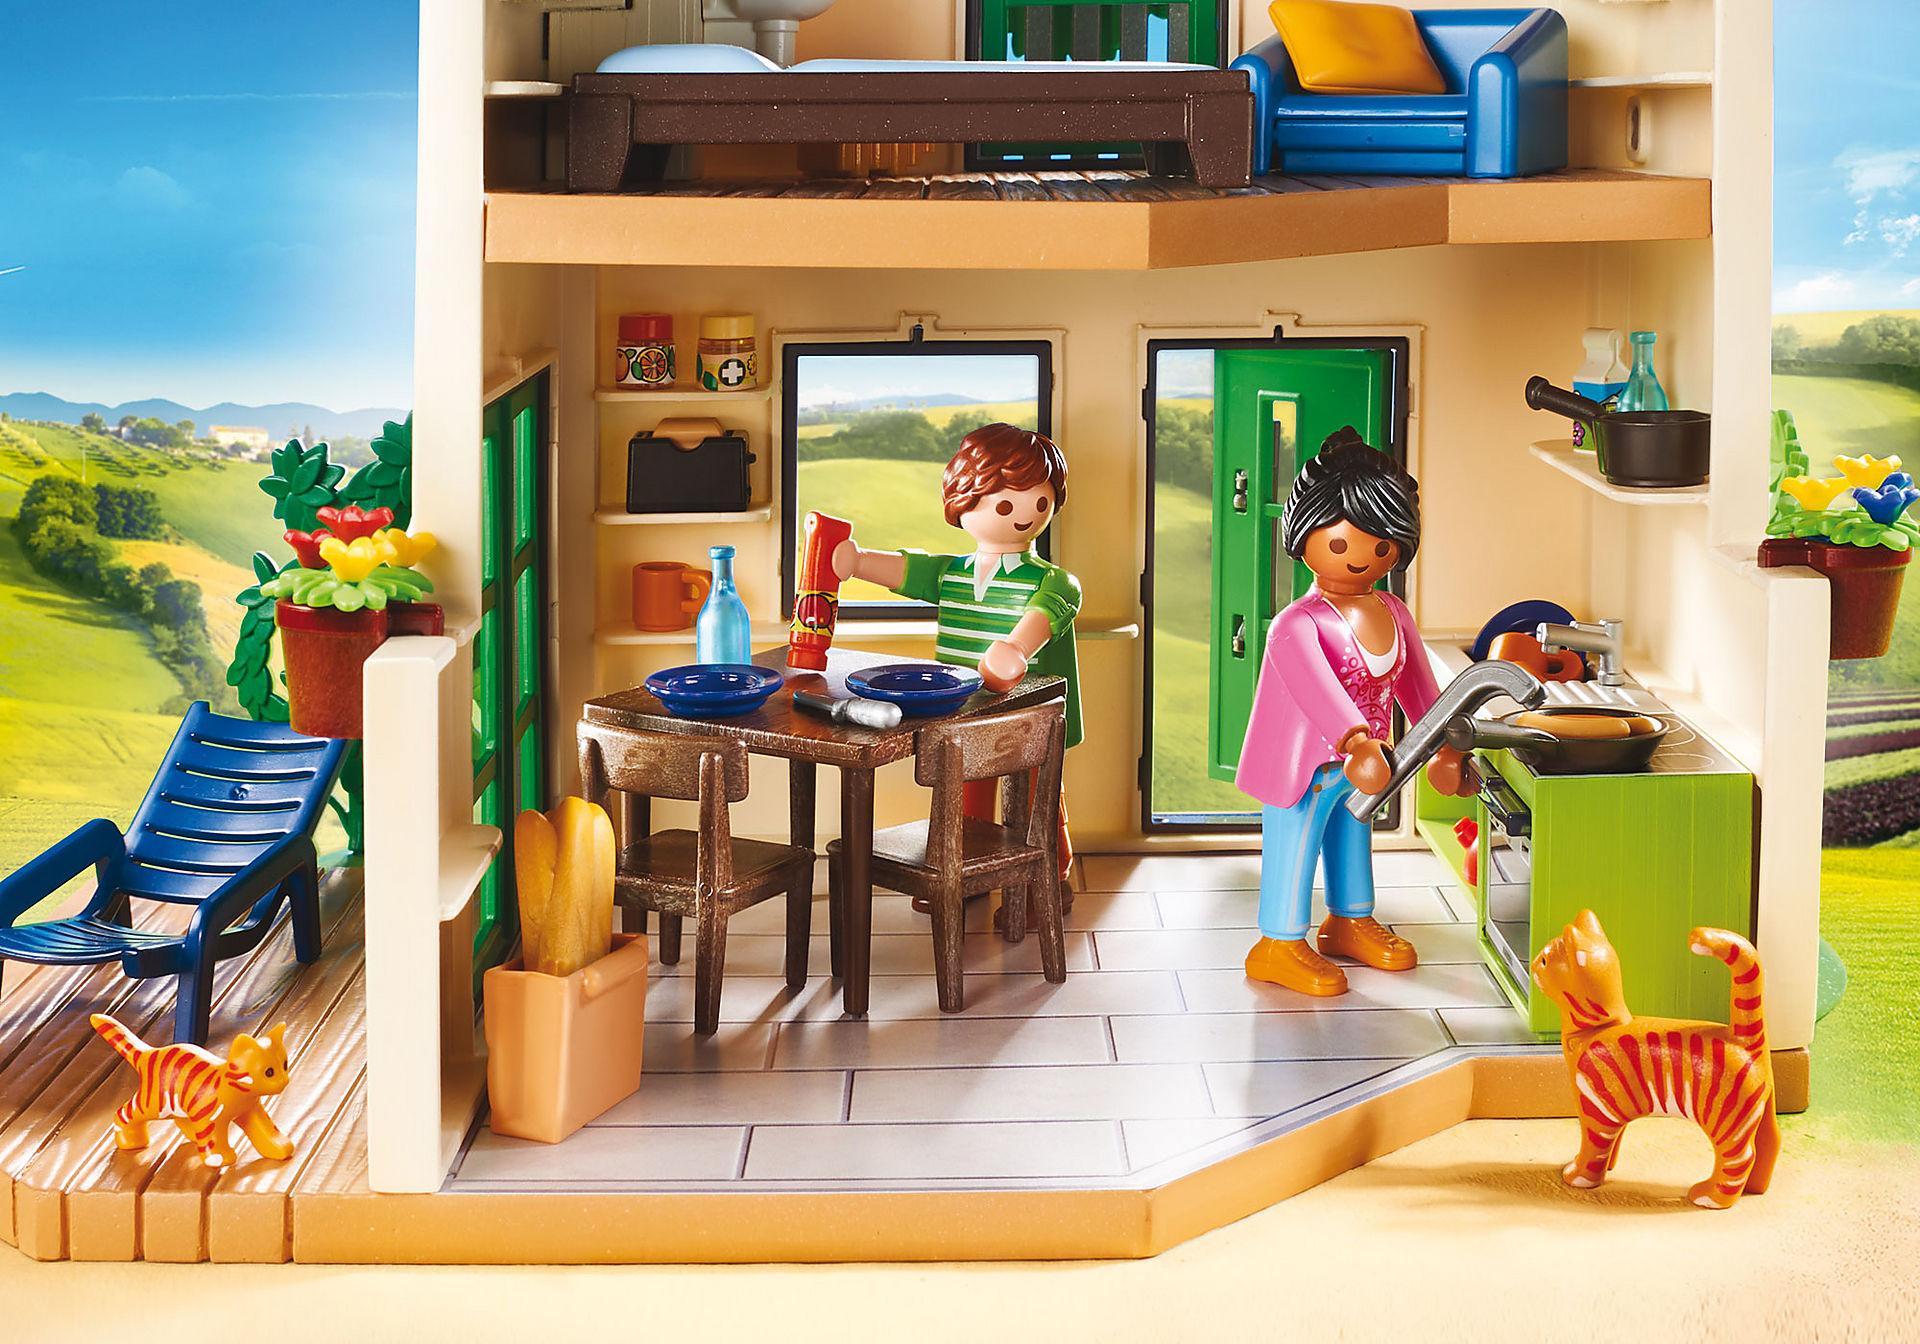 70133 Modern Farmhouse zoom image4